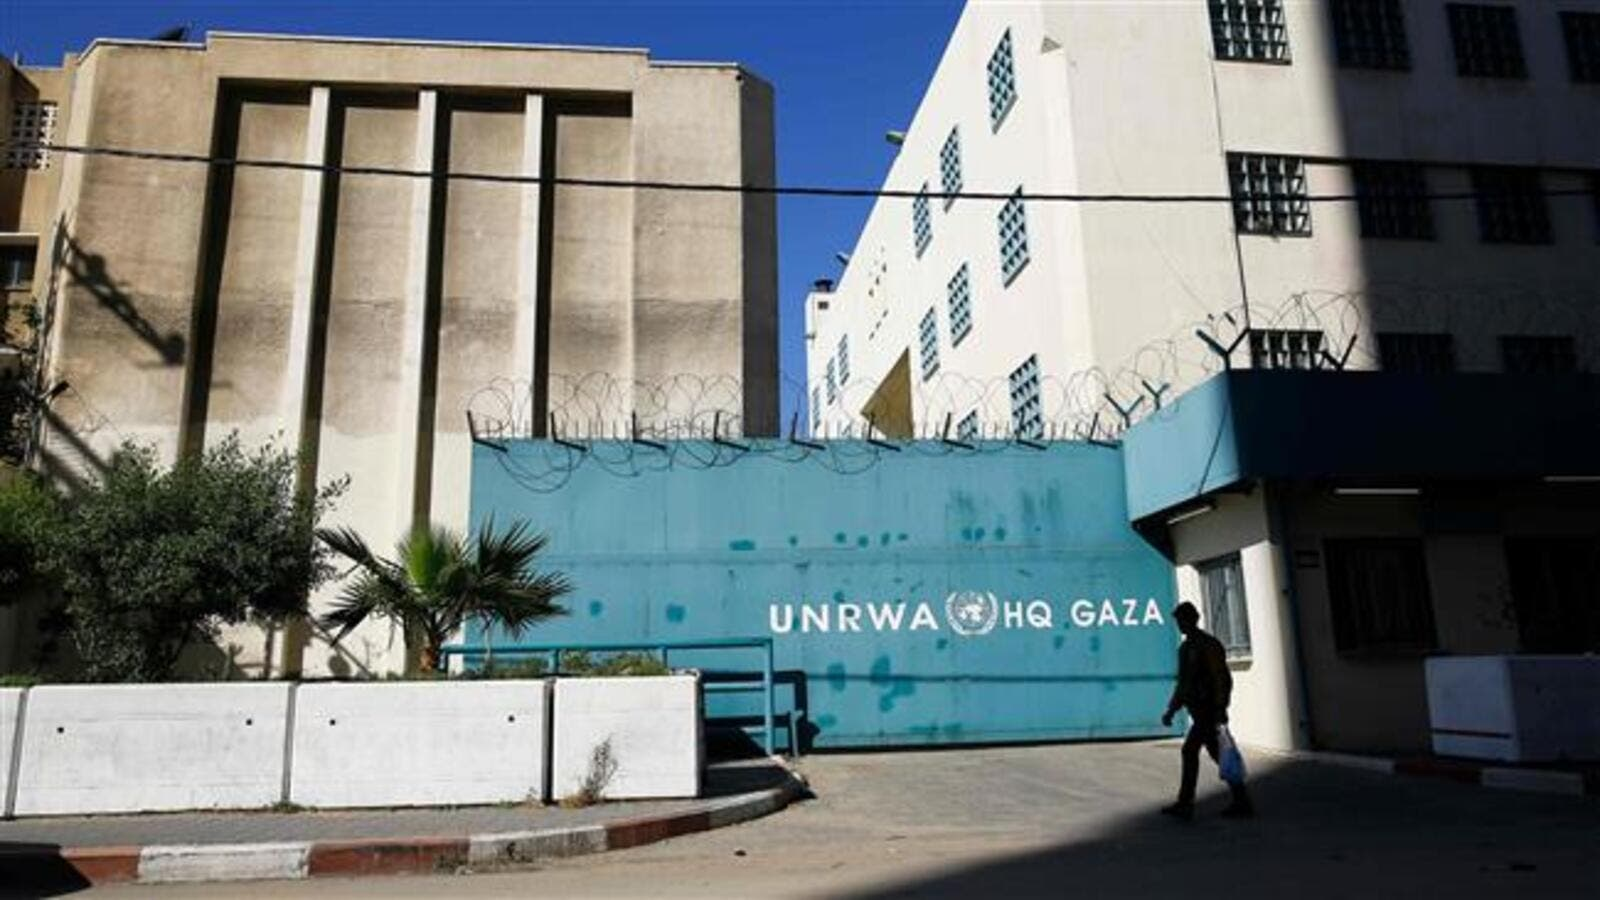 UNRWA Chief Praises Donations as 'Rare Piece of Good News